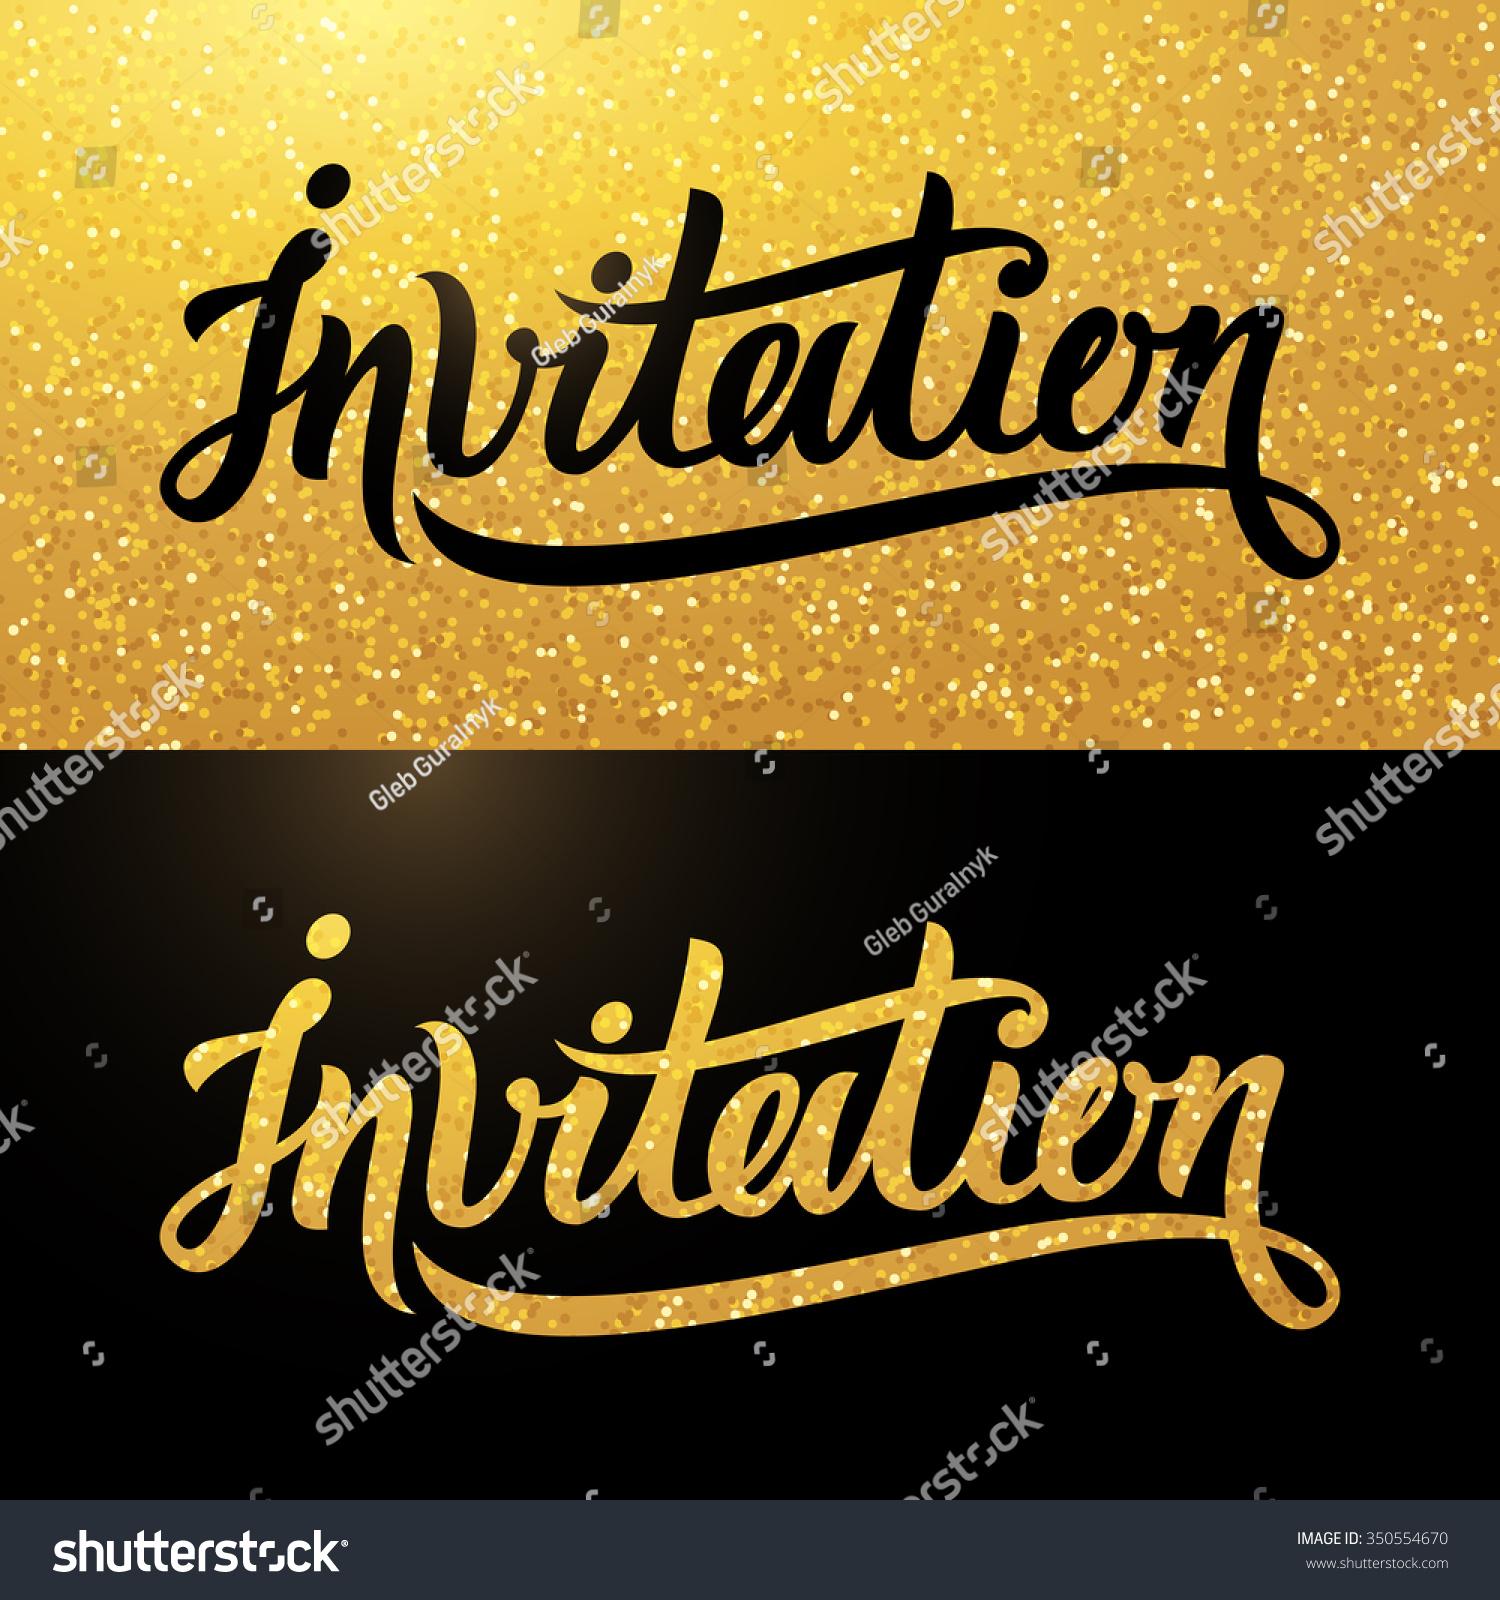 Calligraphy postcard handwritten word invitation on stock vector calligraphy postcard with handwritten word invitation on sparkling gold background stopboris Images